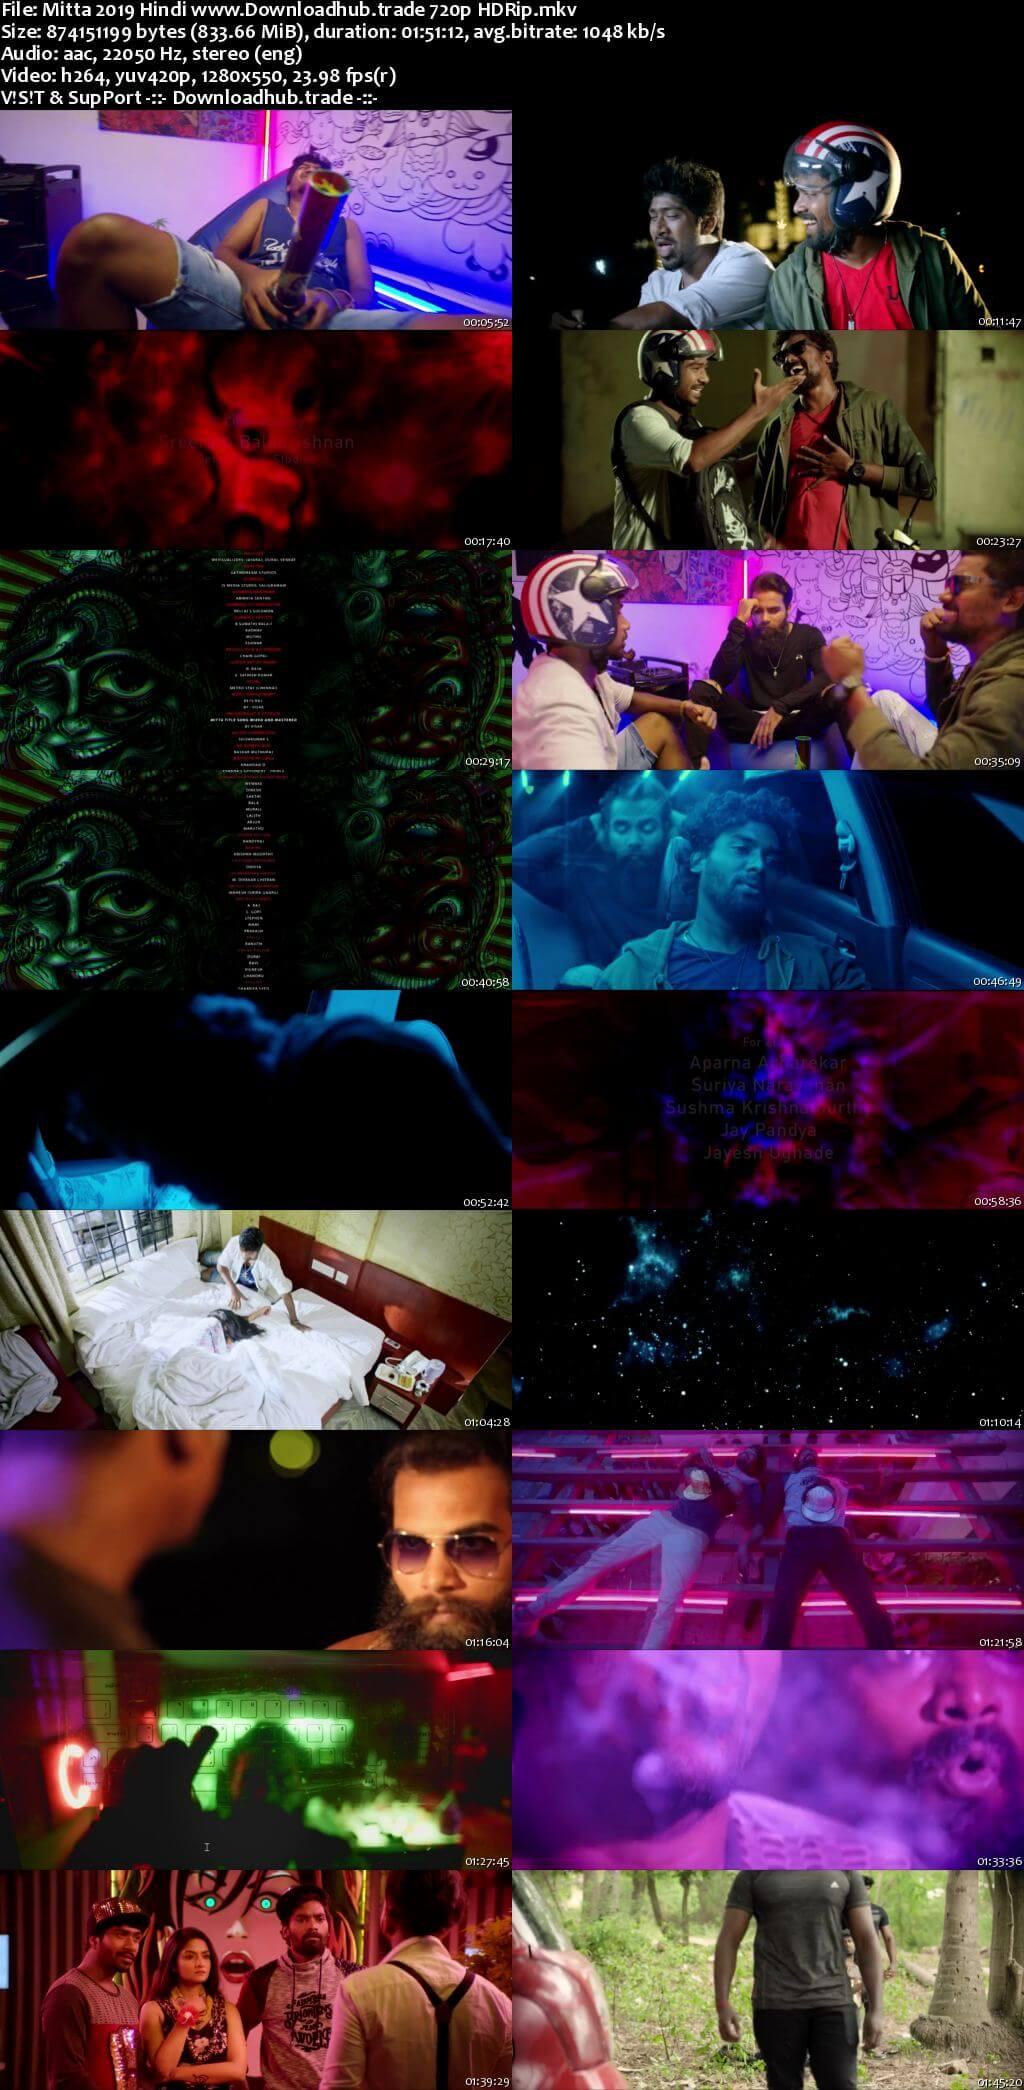 Mitta 2019 Hindi 720p HDRip x264